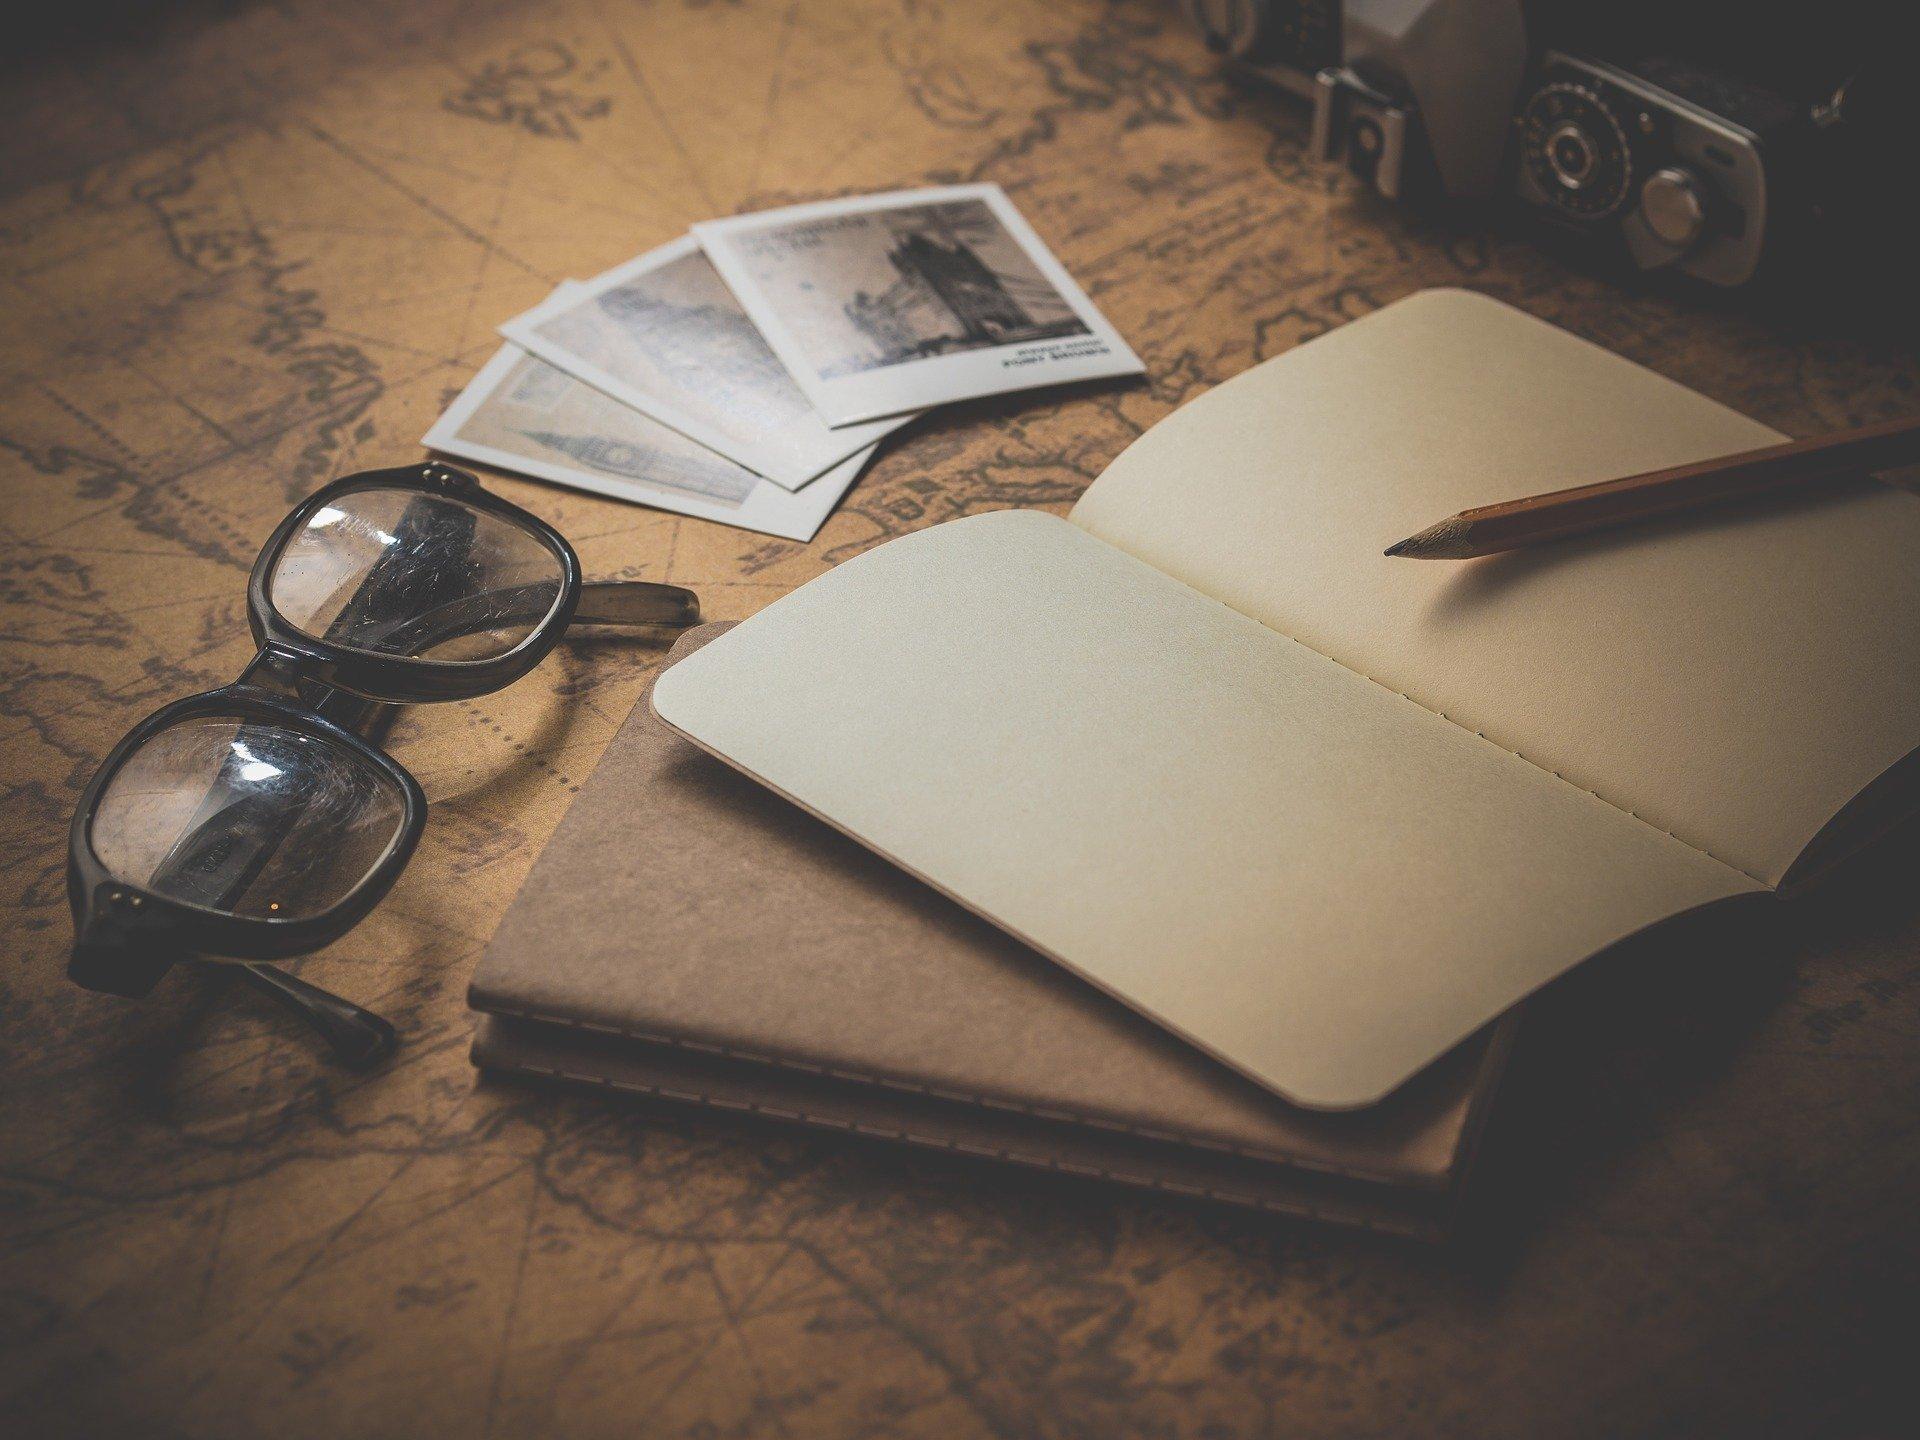 rejse-planlaegning